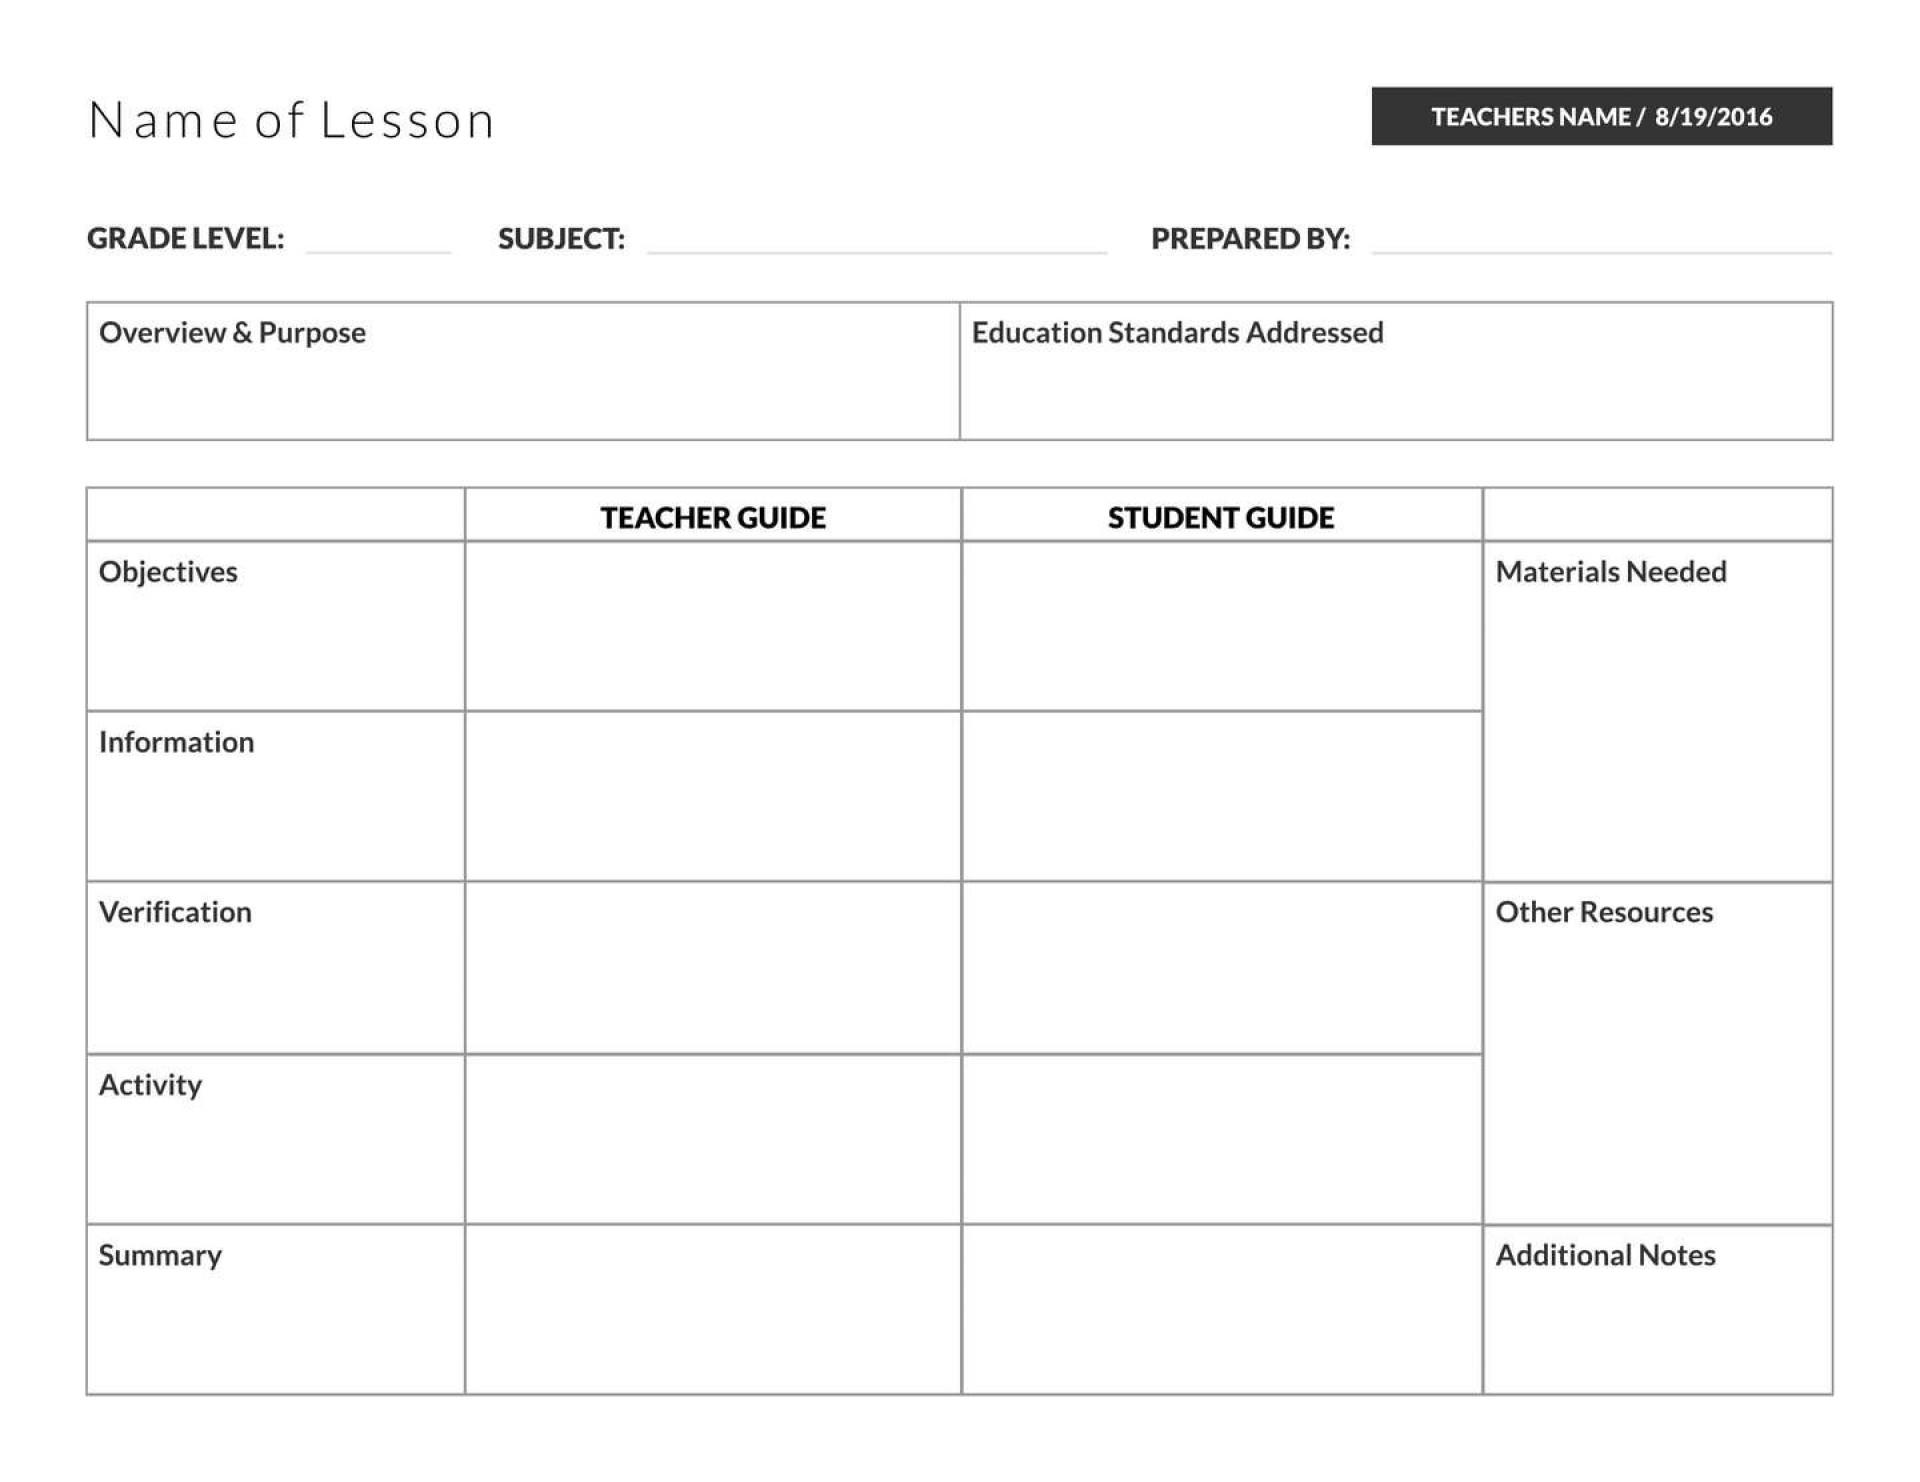 004 Impressive Template For Lesson Plan High Definition  Plans Pdf School Sample1920